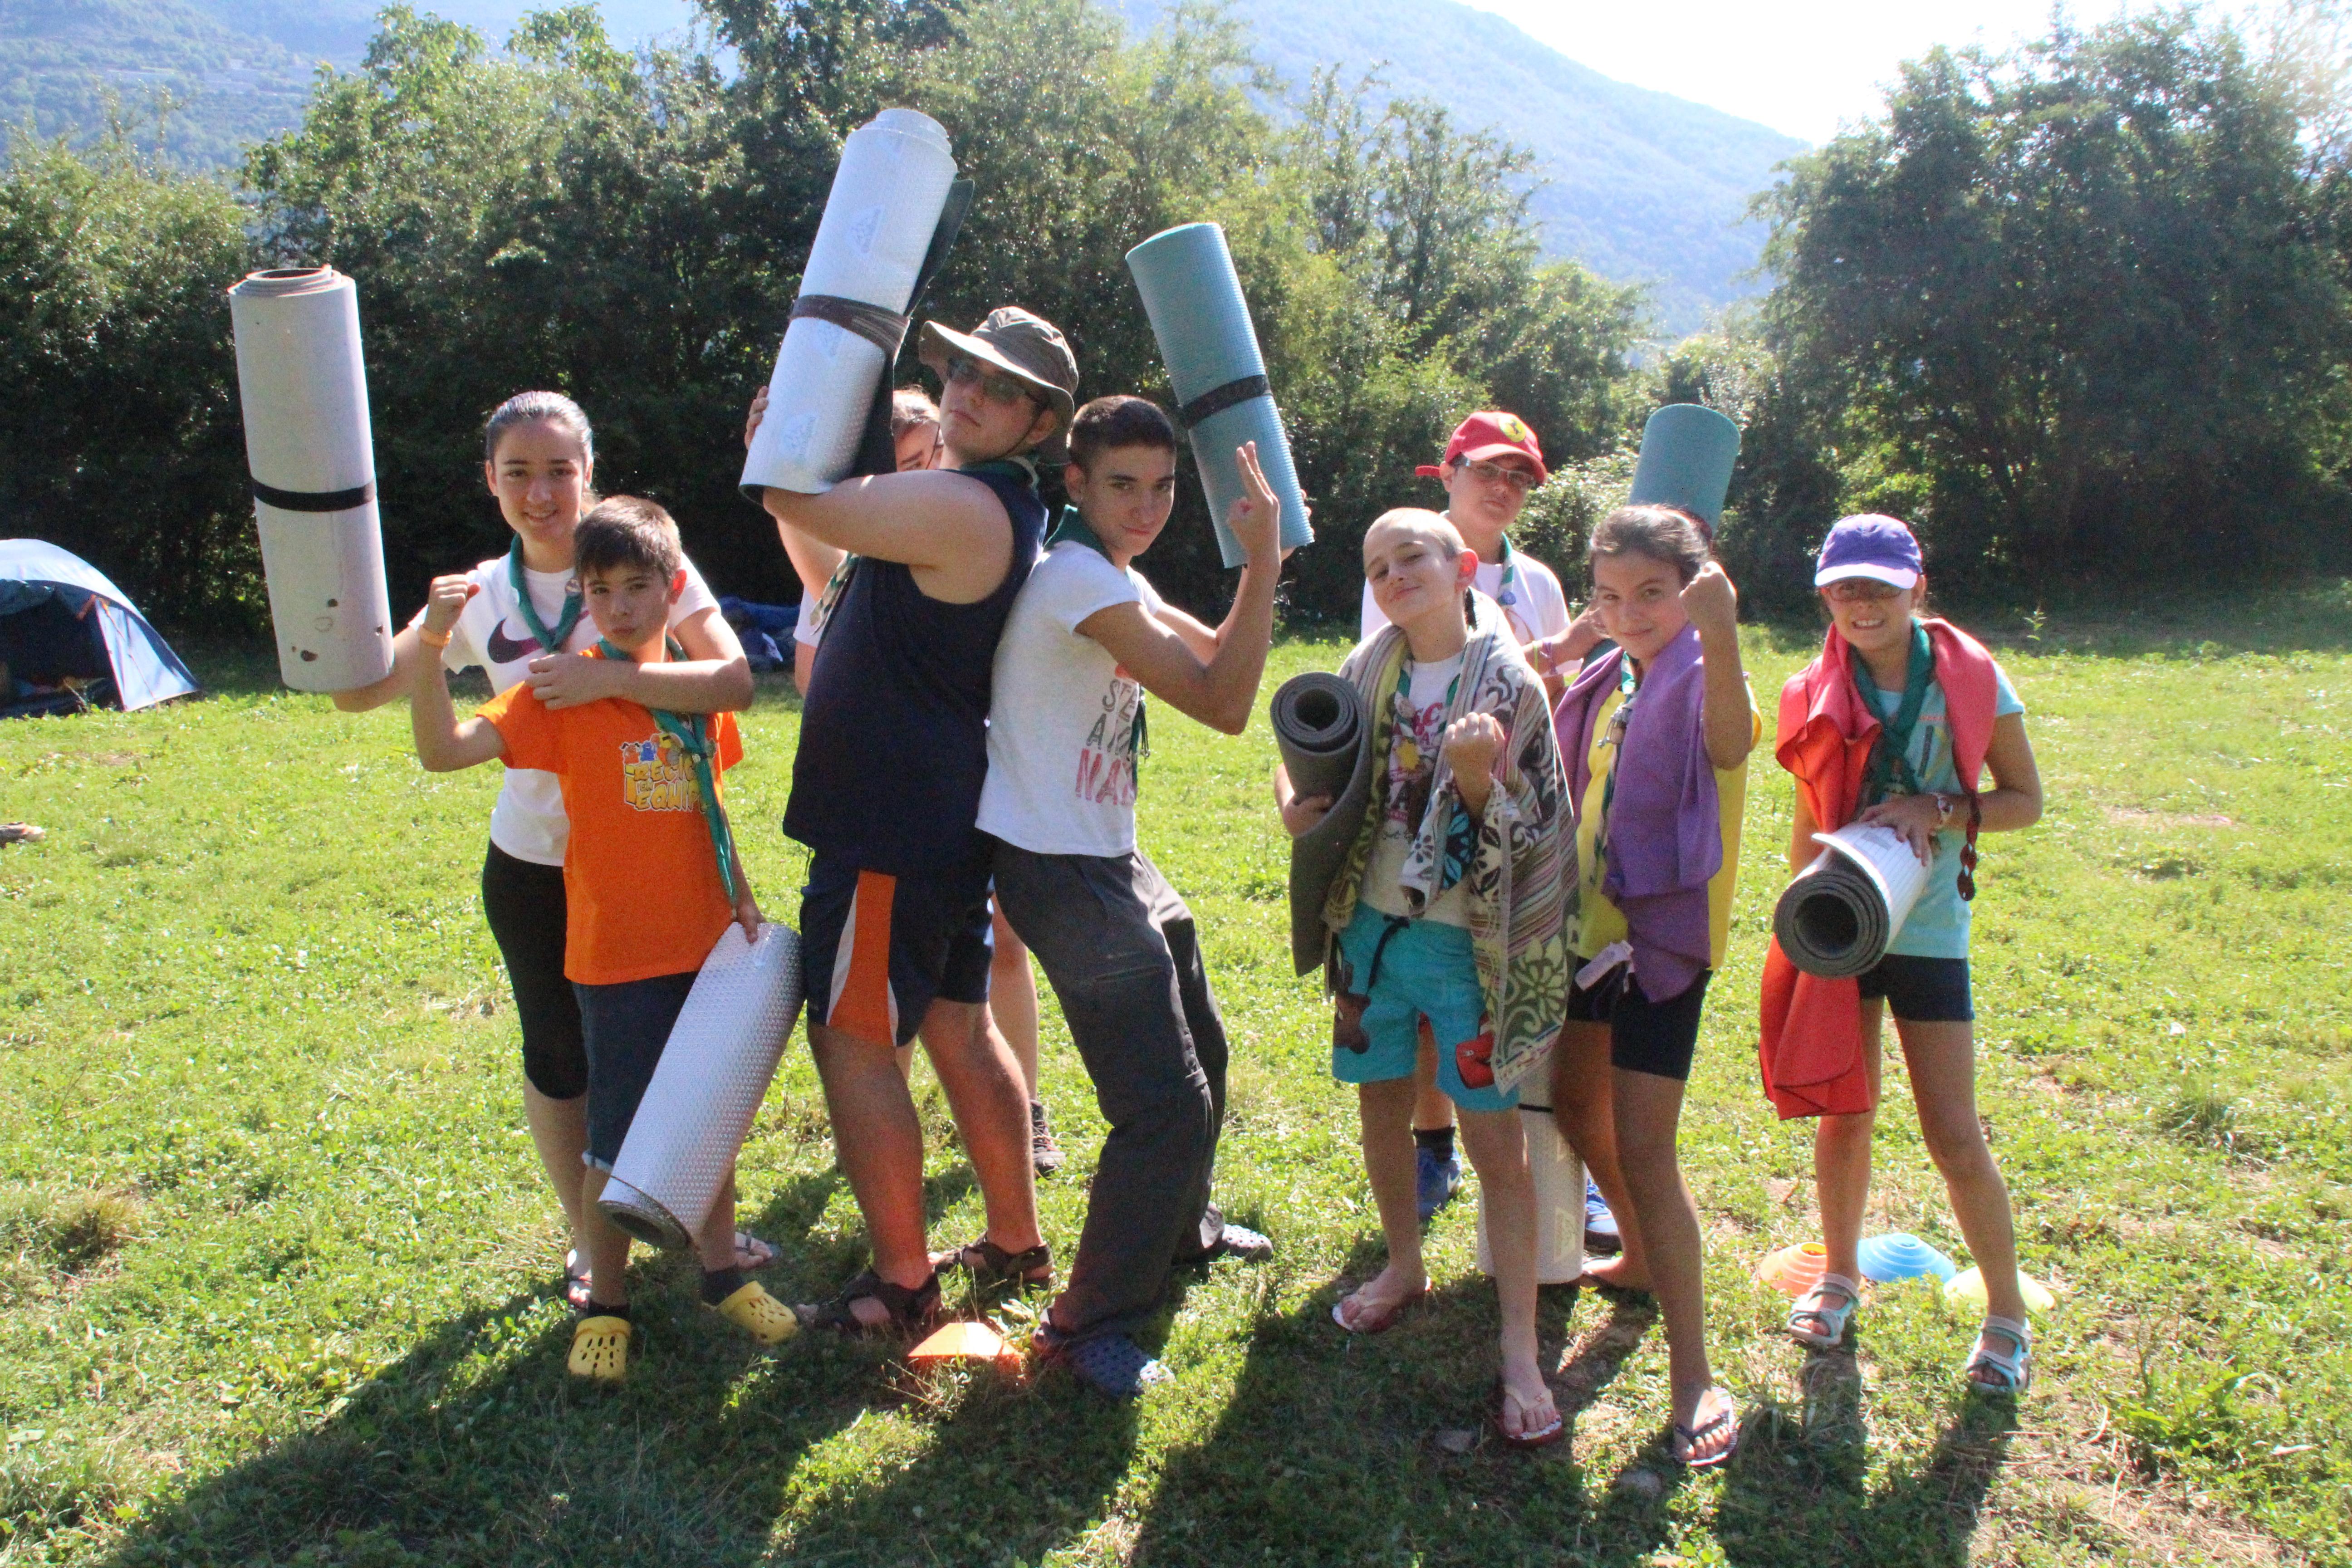 15-16 - Grupo - Campamento de verano - P92